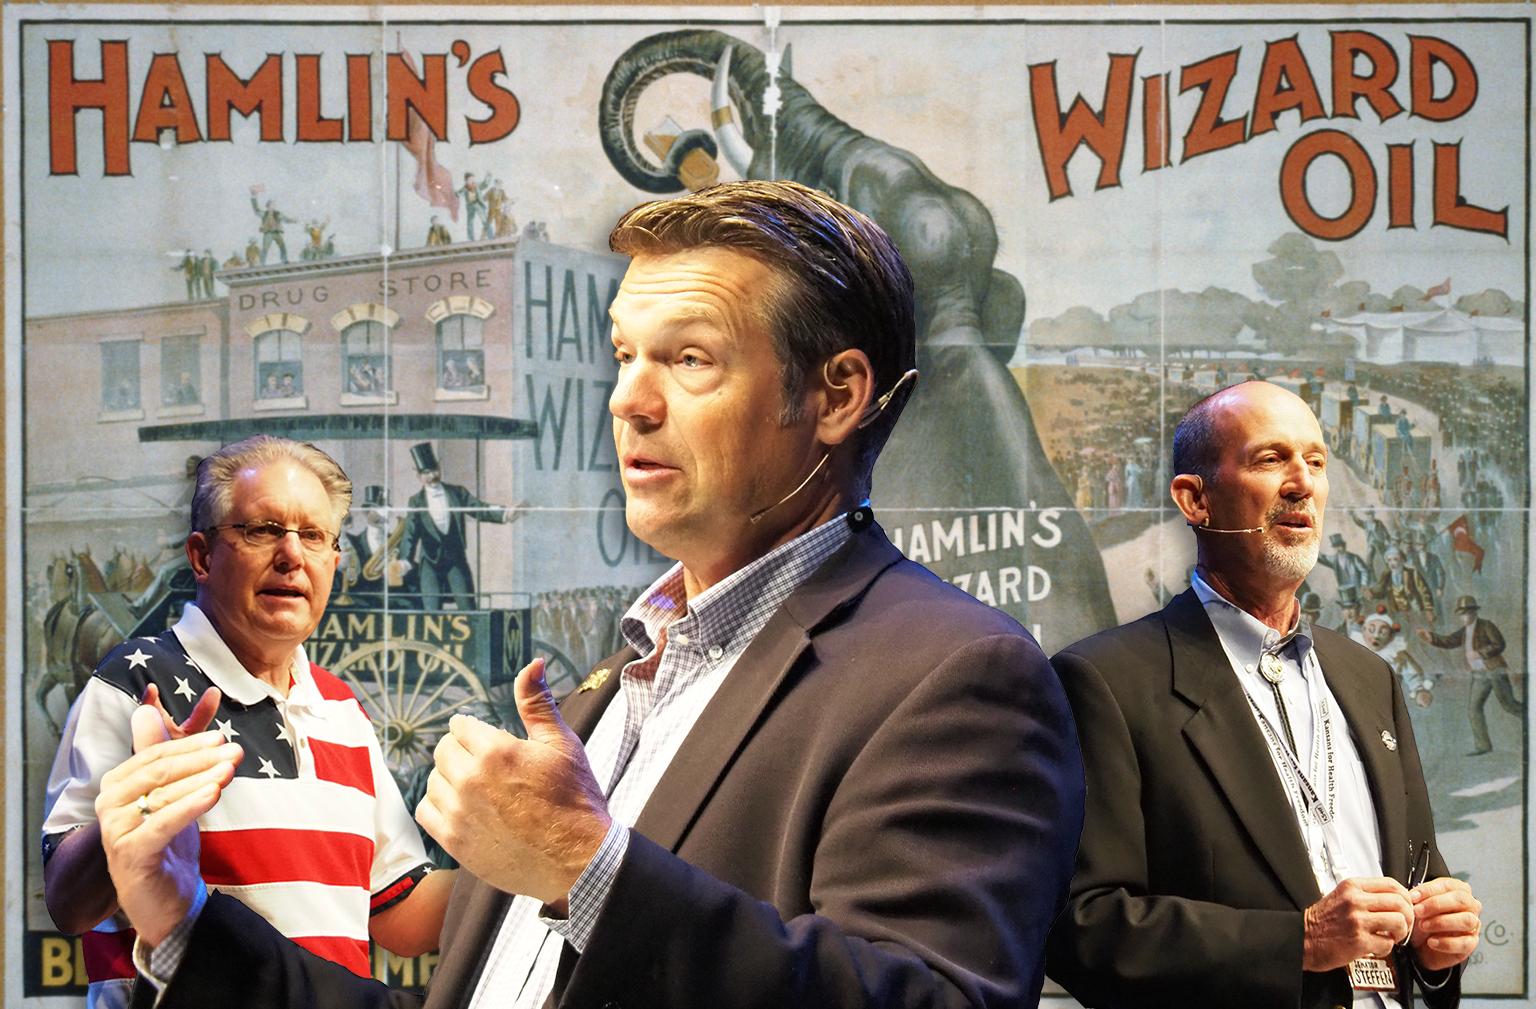 Plenty of hokum, grift and conspiracy mongering at Kansas anti-vax medicine show